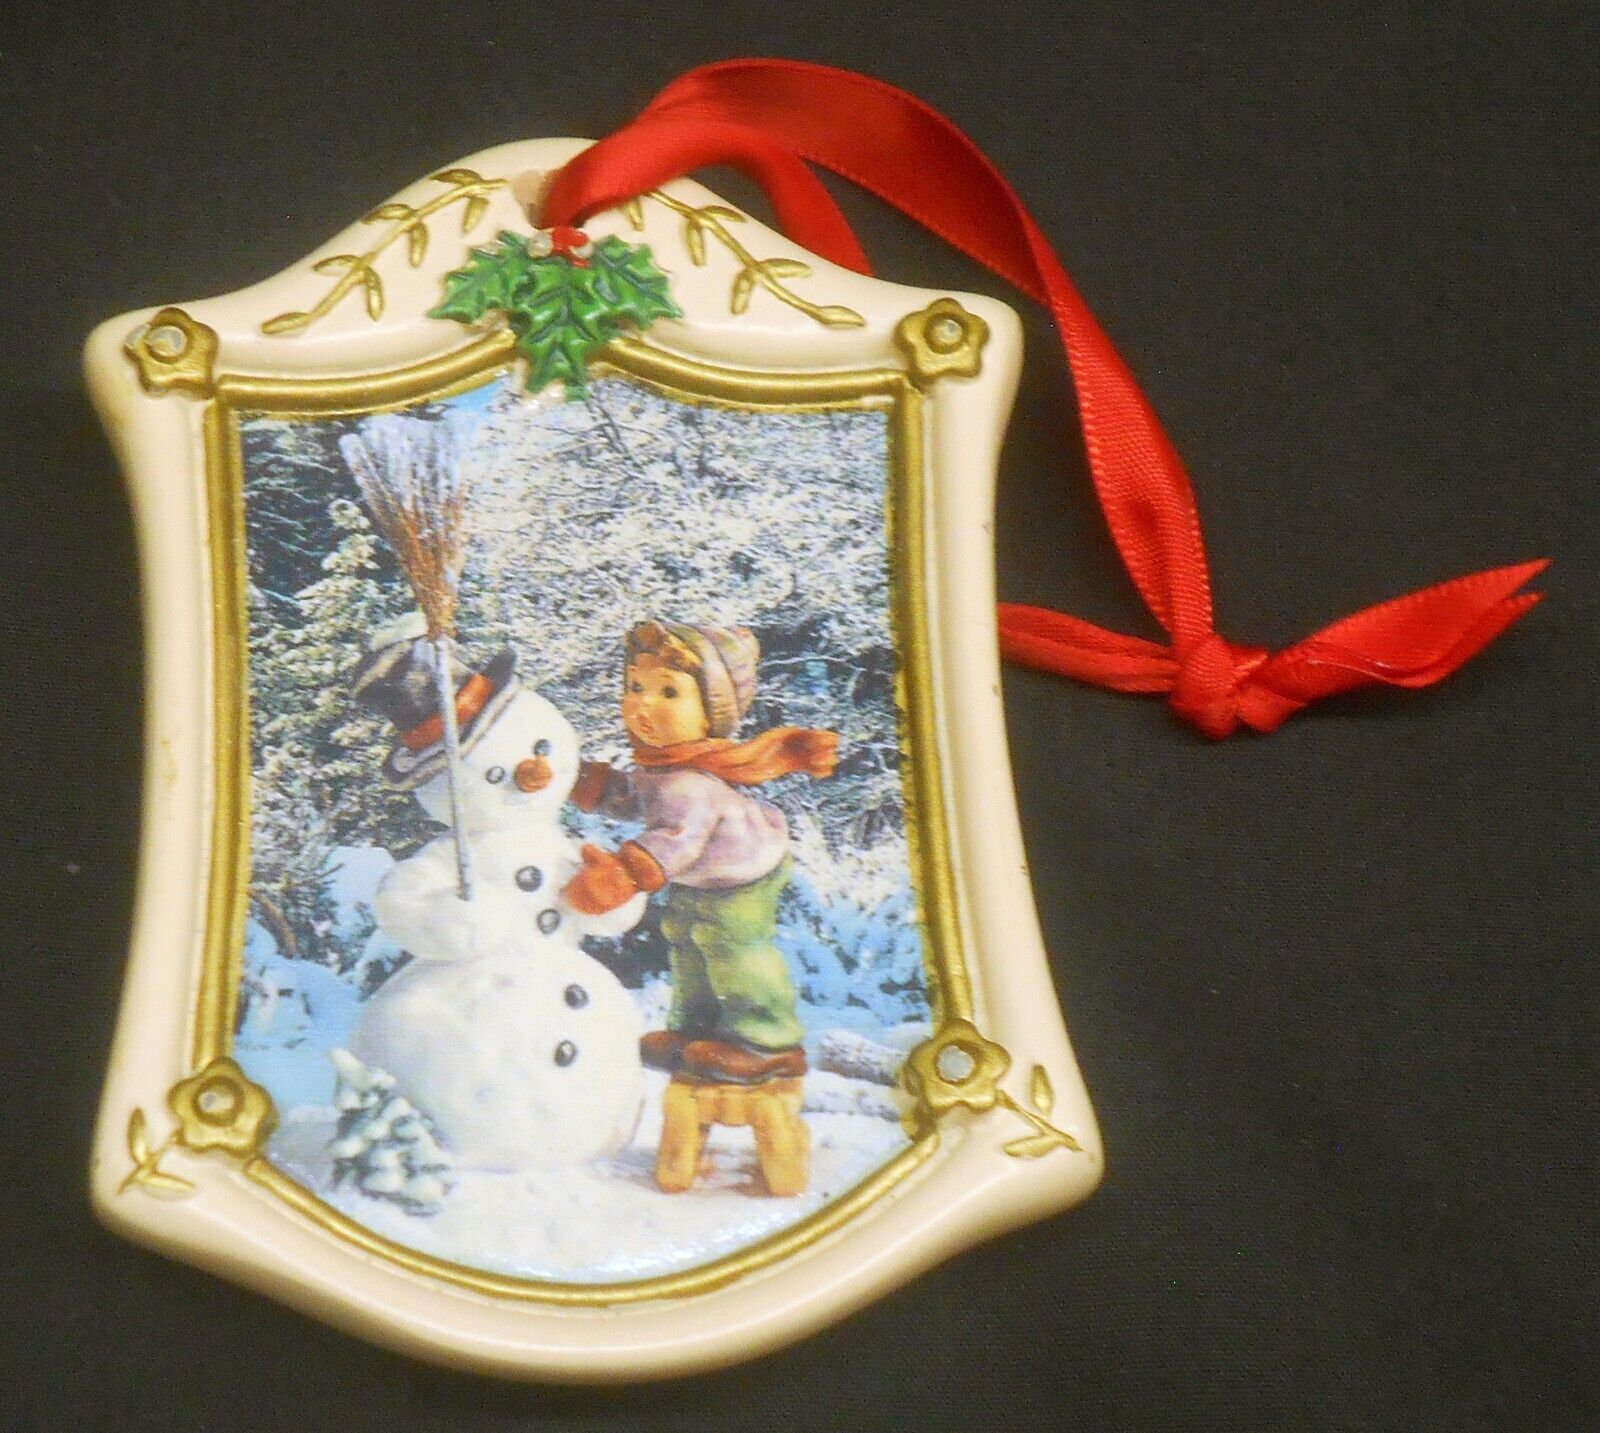 Danbury Mint Hummel Making New Friends Boy Snowman Ornament Ebay